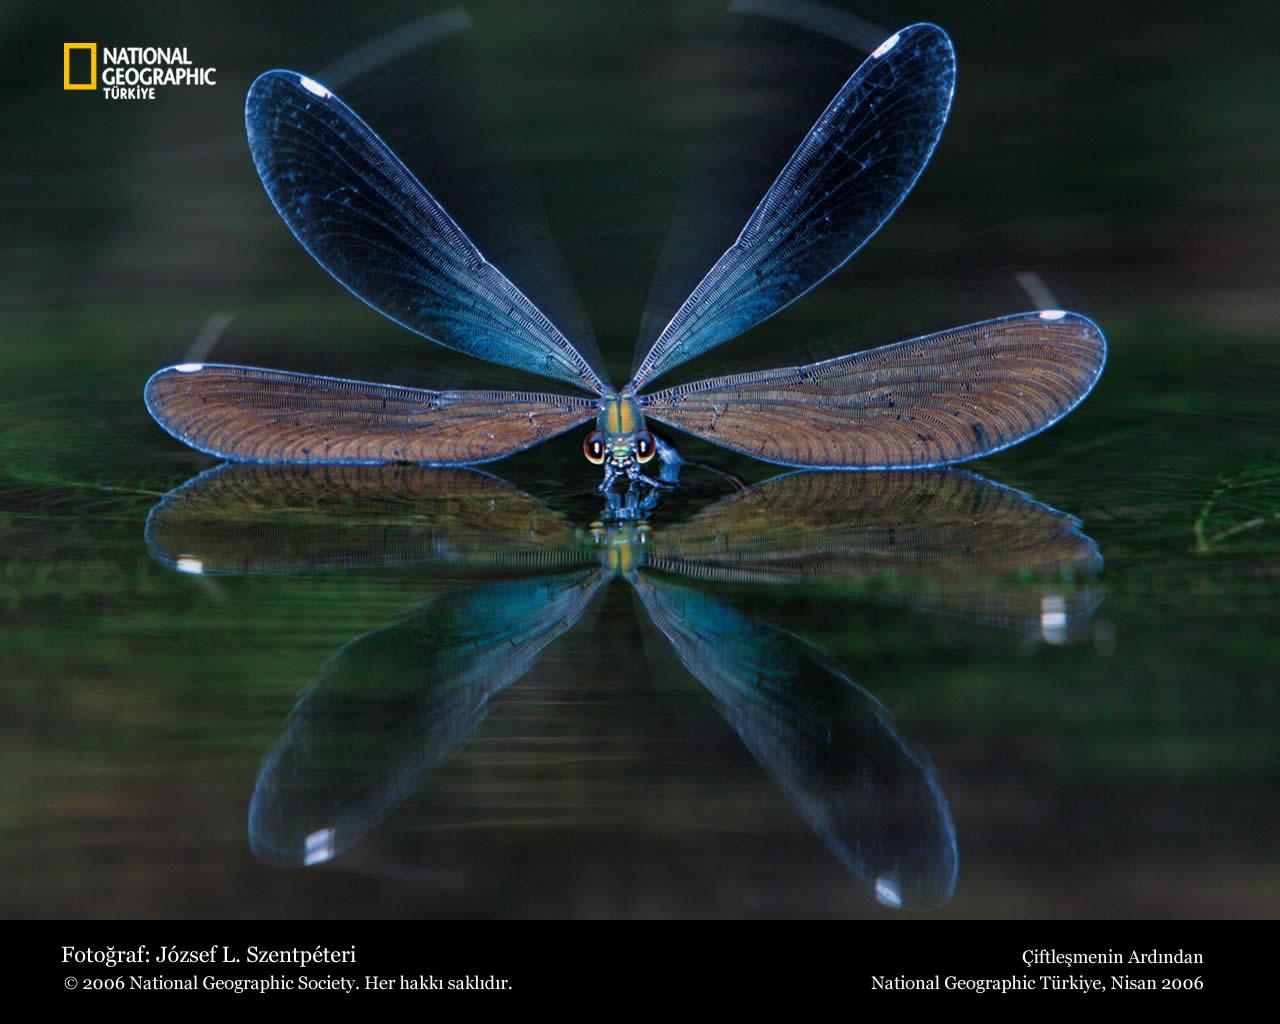 Funny Dragonfly wallpaper for desktop Funny Animal 1280x1024